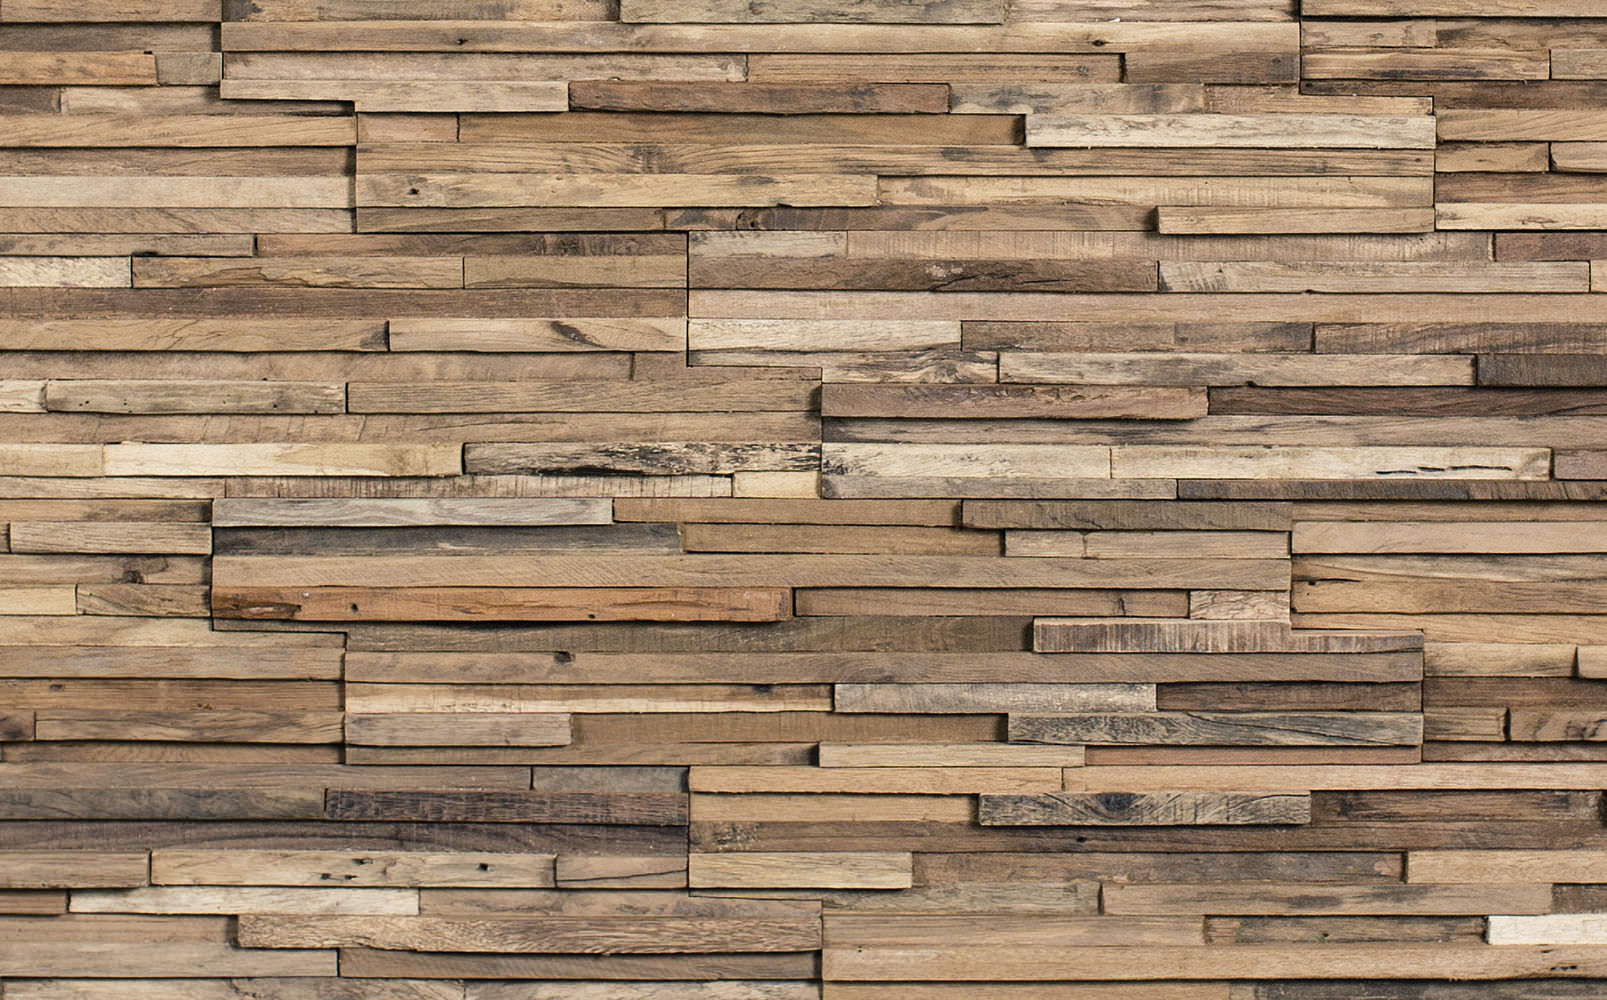 wooden decorative walls photo - 10